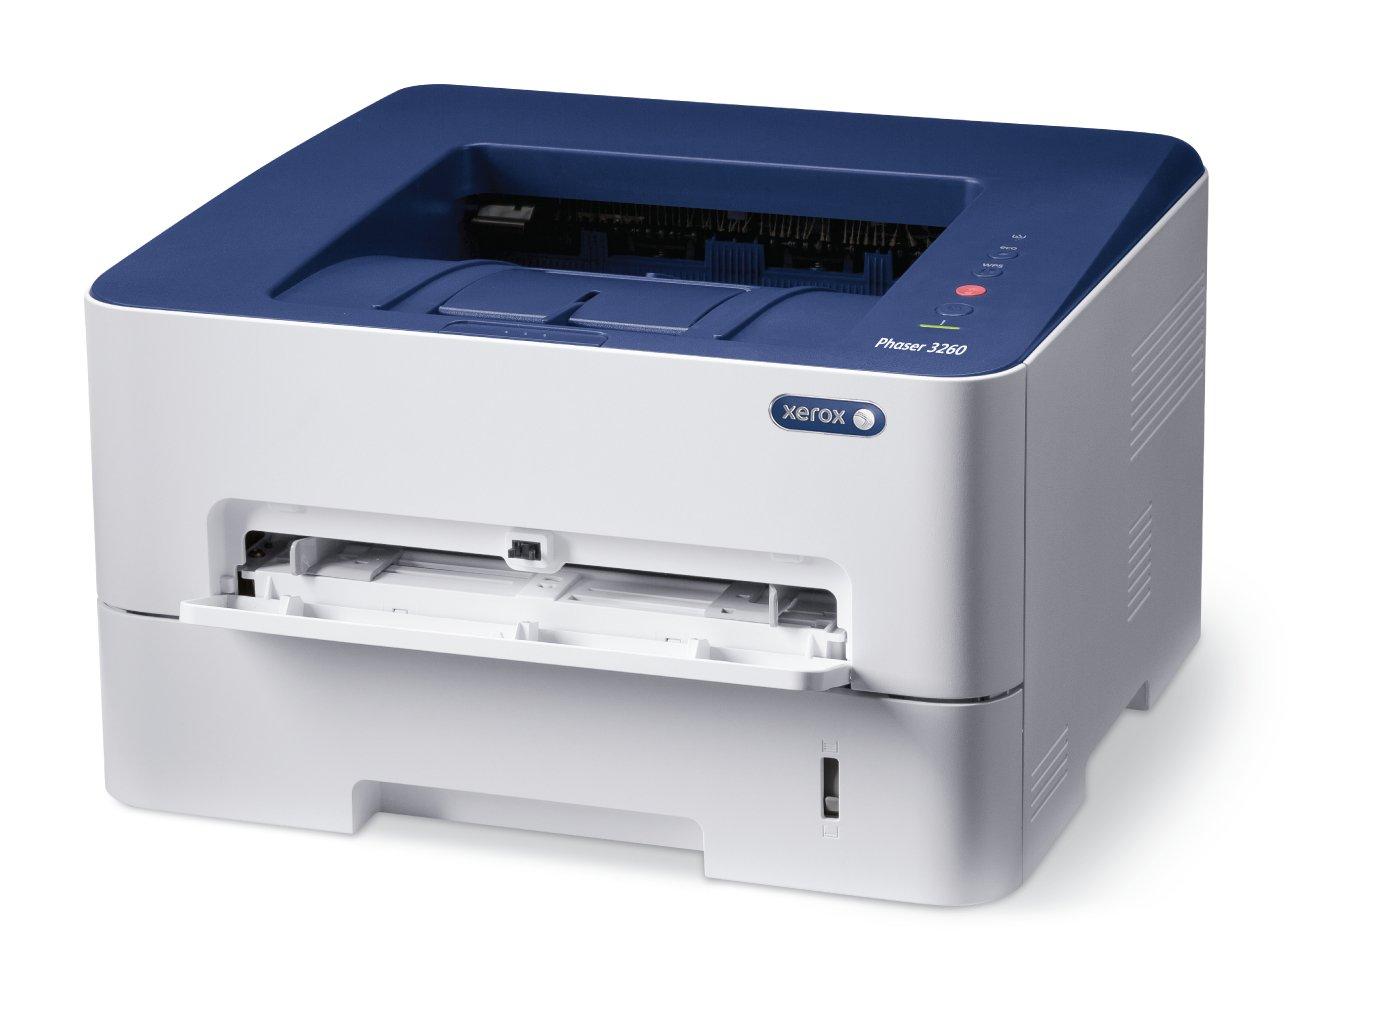 Amazon.com: Xerox Phaser 3260/DNI Monchrome Laser Printer - Wireless:  Electronics